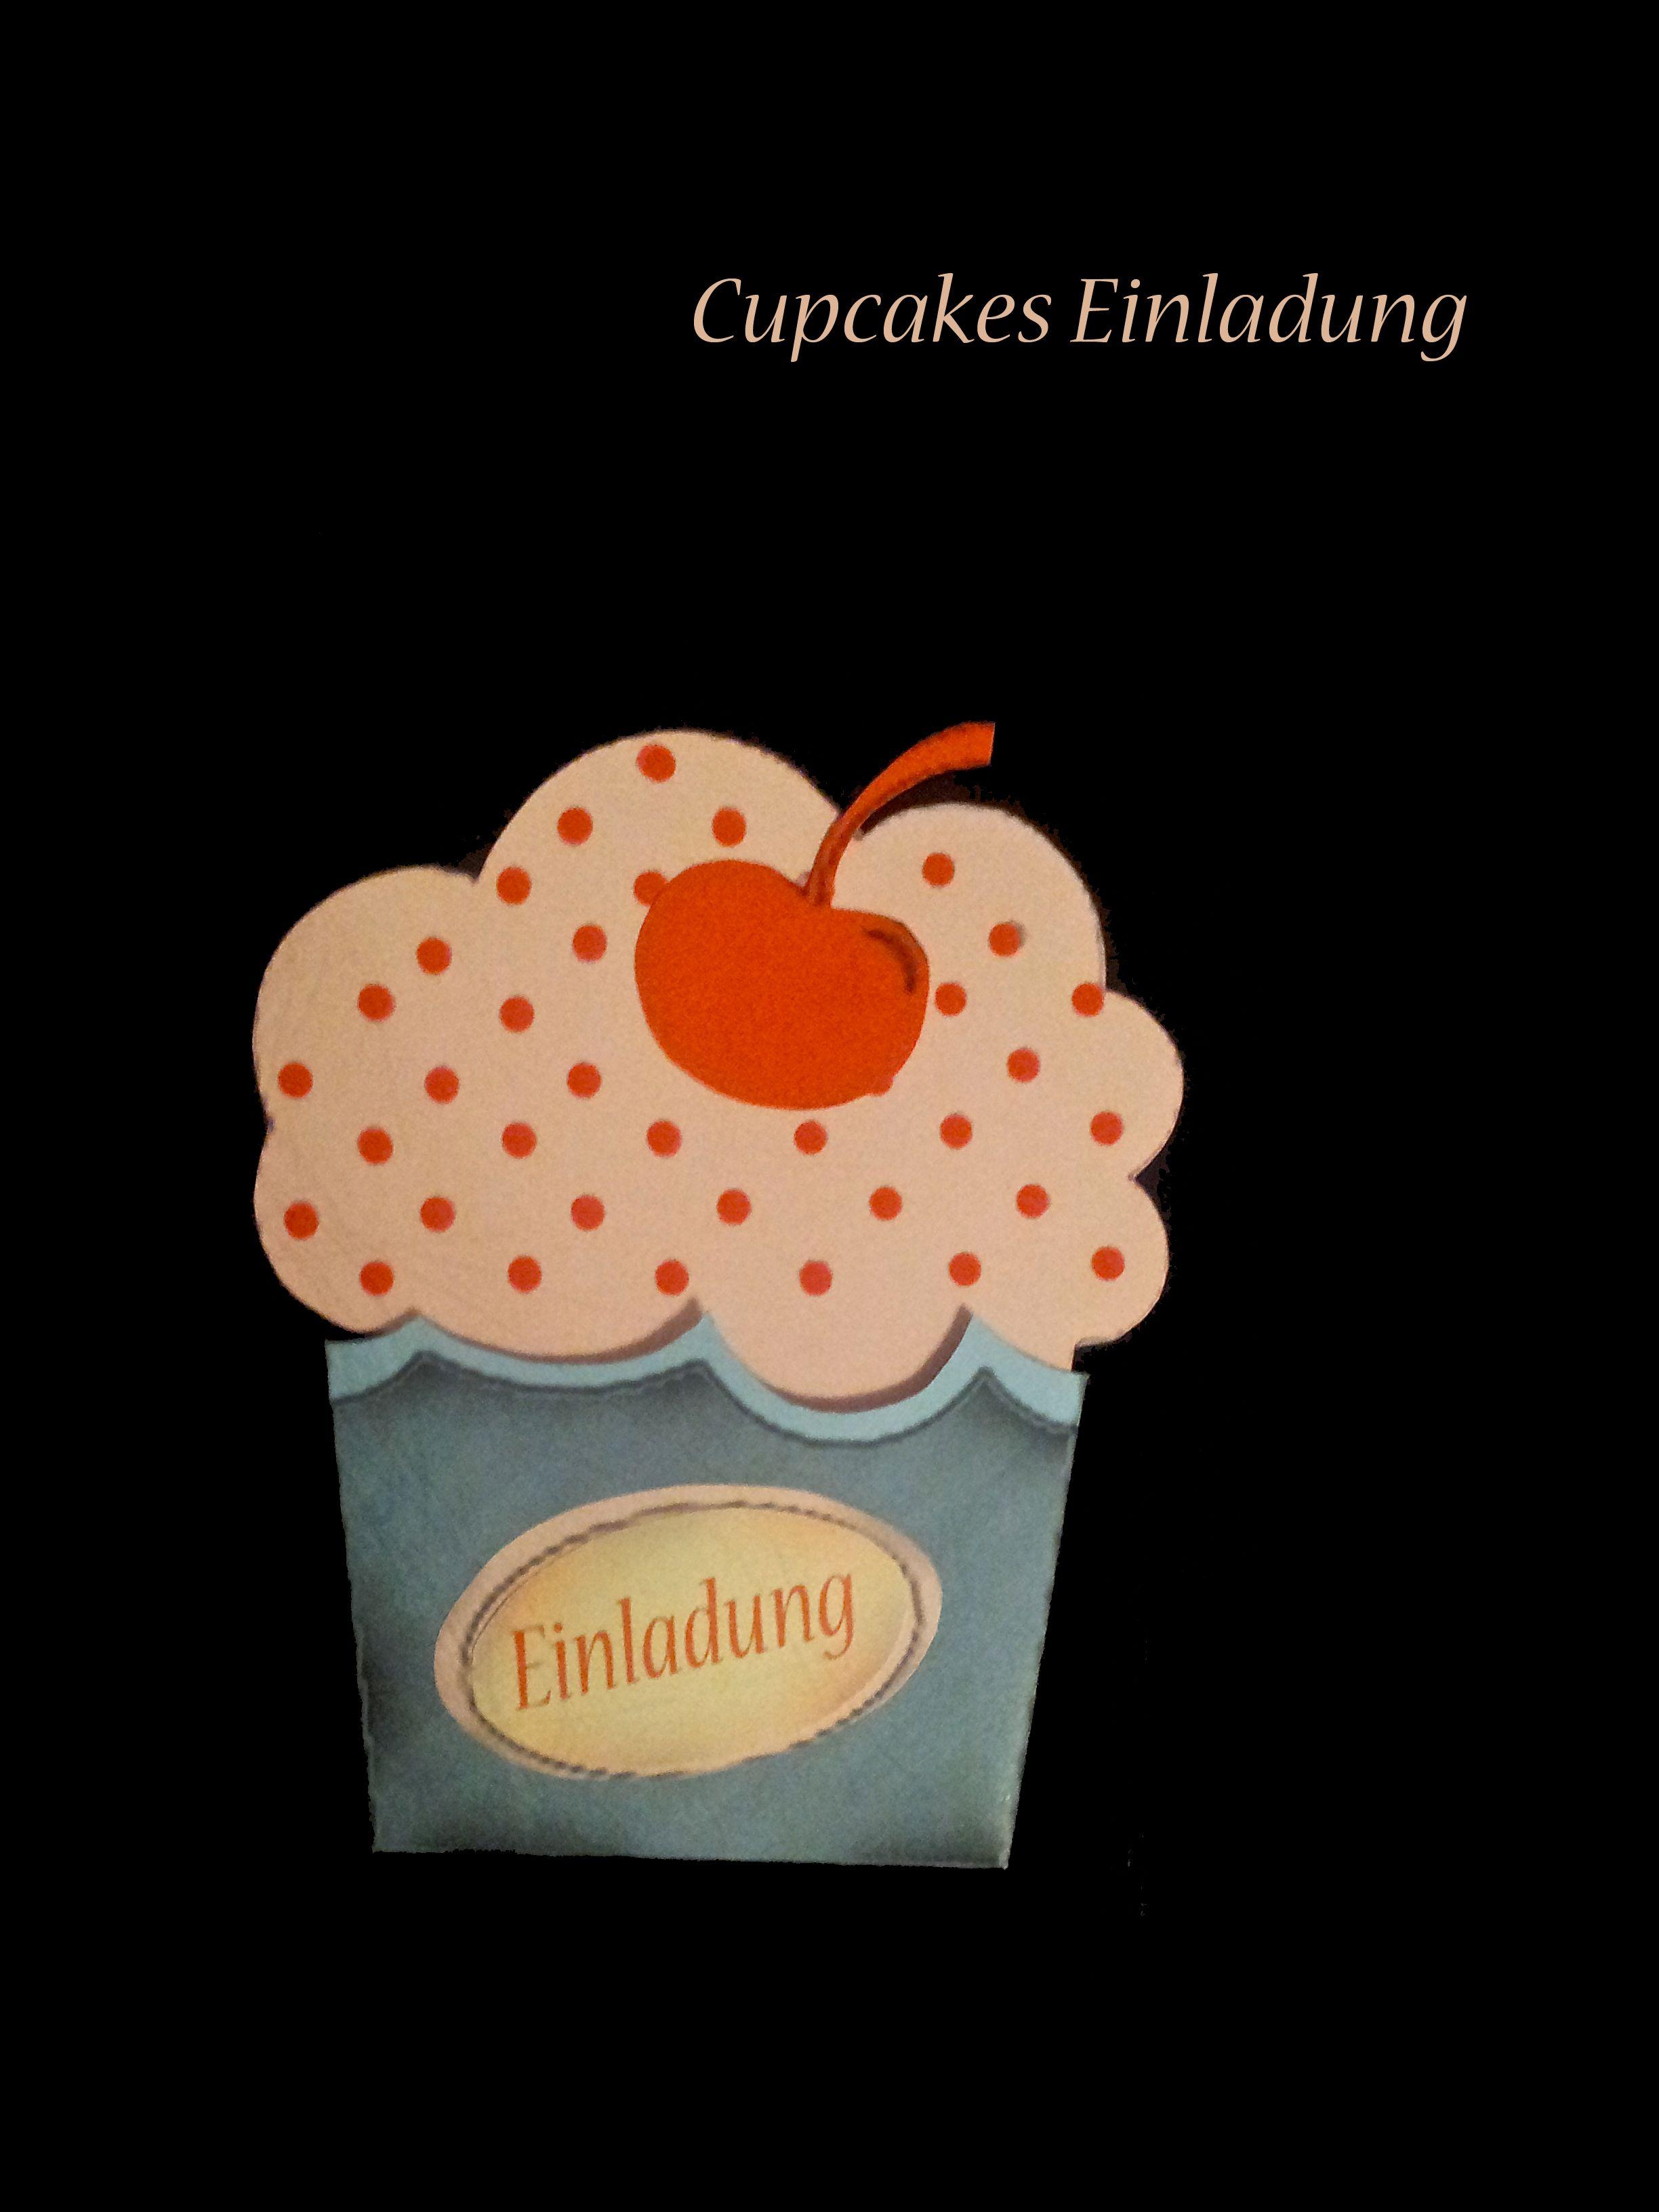 Http://de.dawanda.com/product/51113238 Cupcakes  · EinladungenKartenEinladung  KindergeburtstagDawanda ...